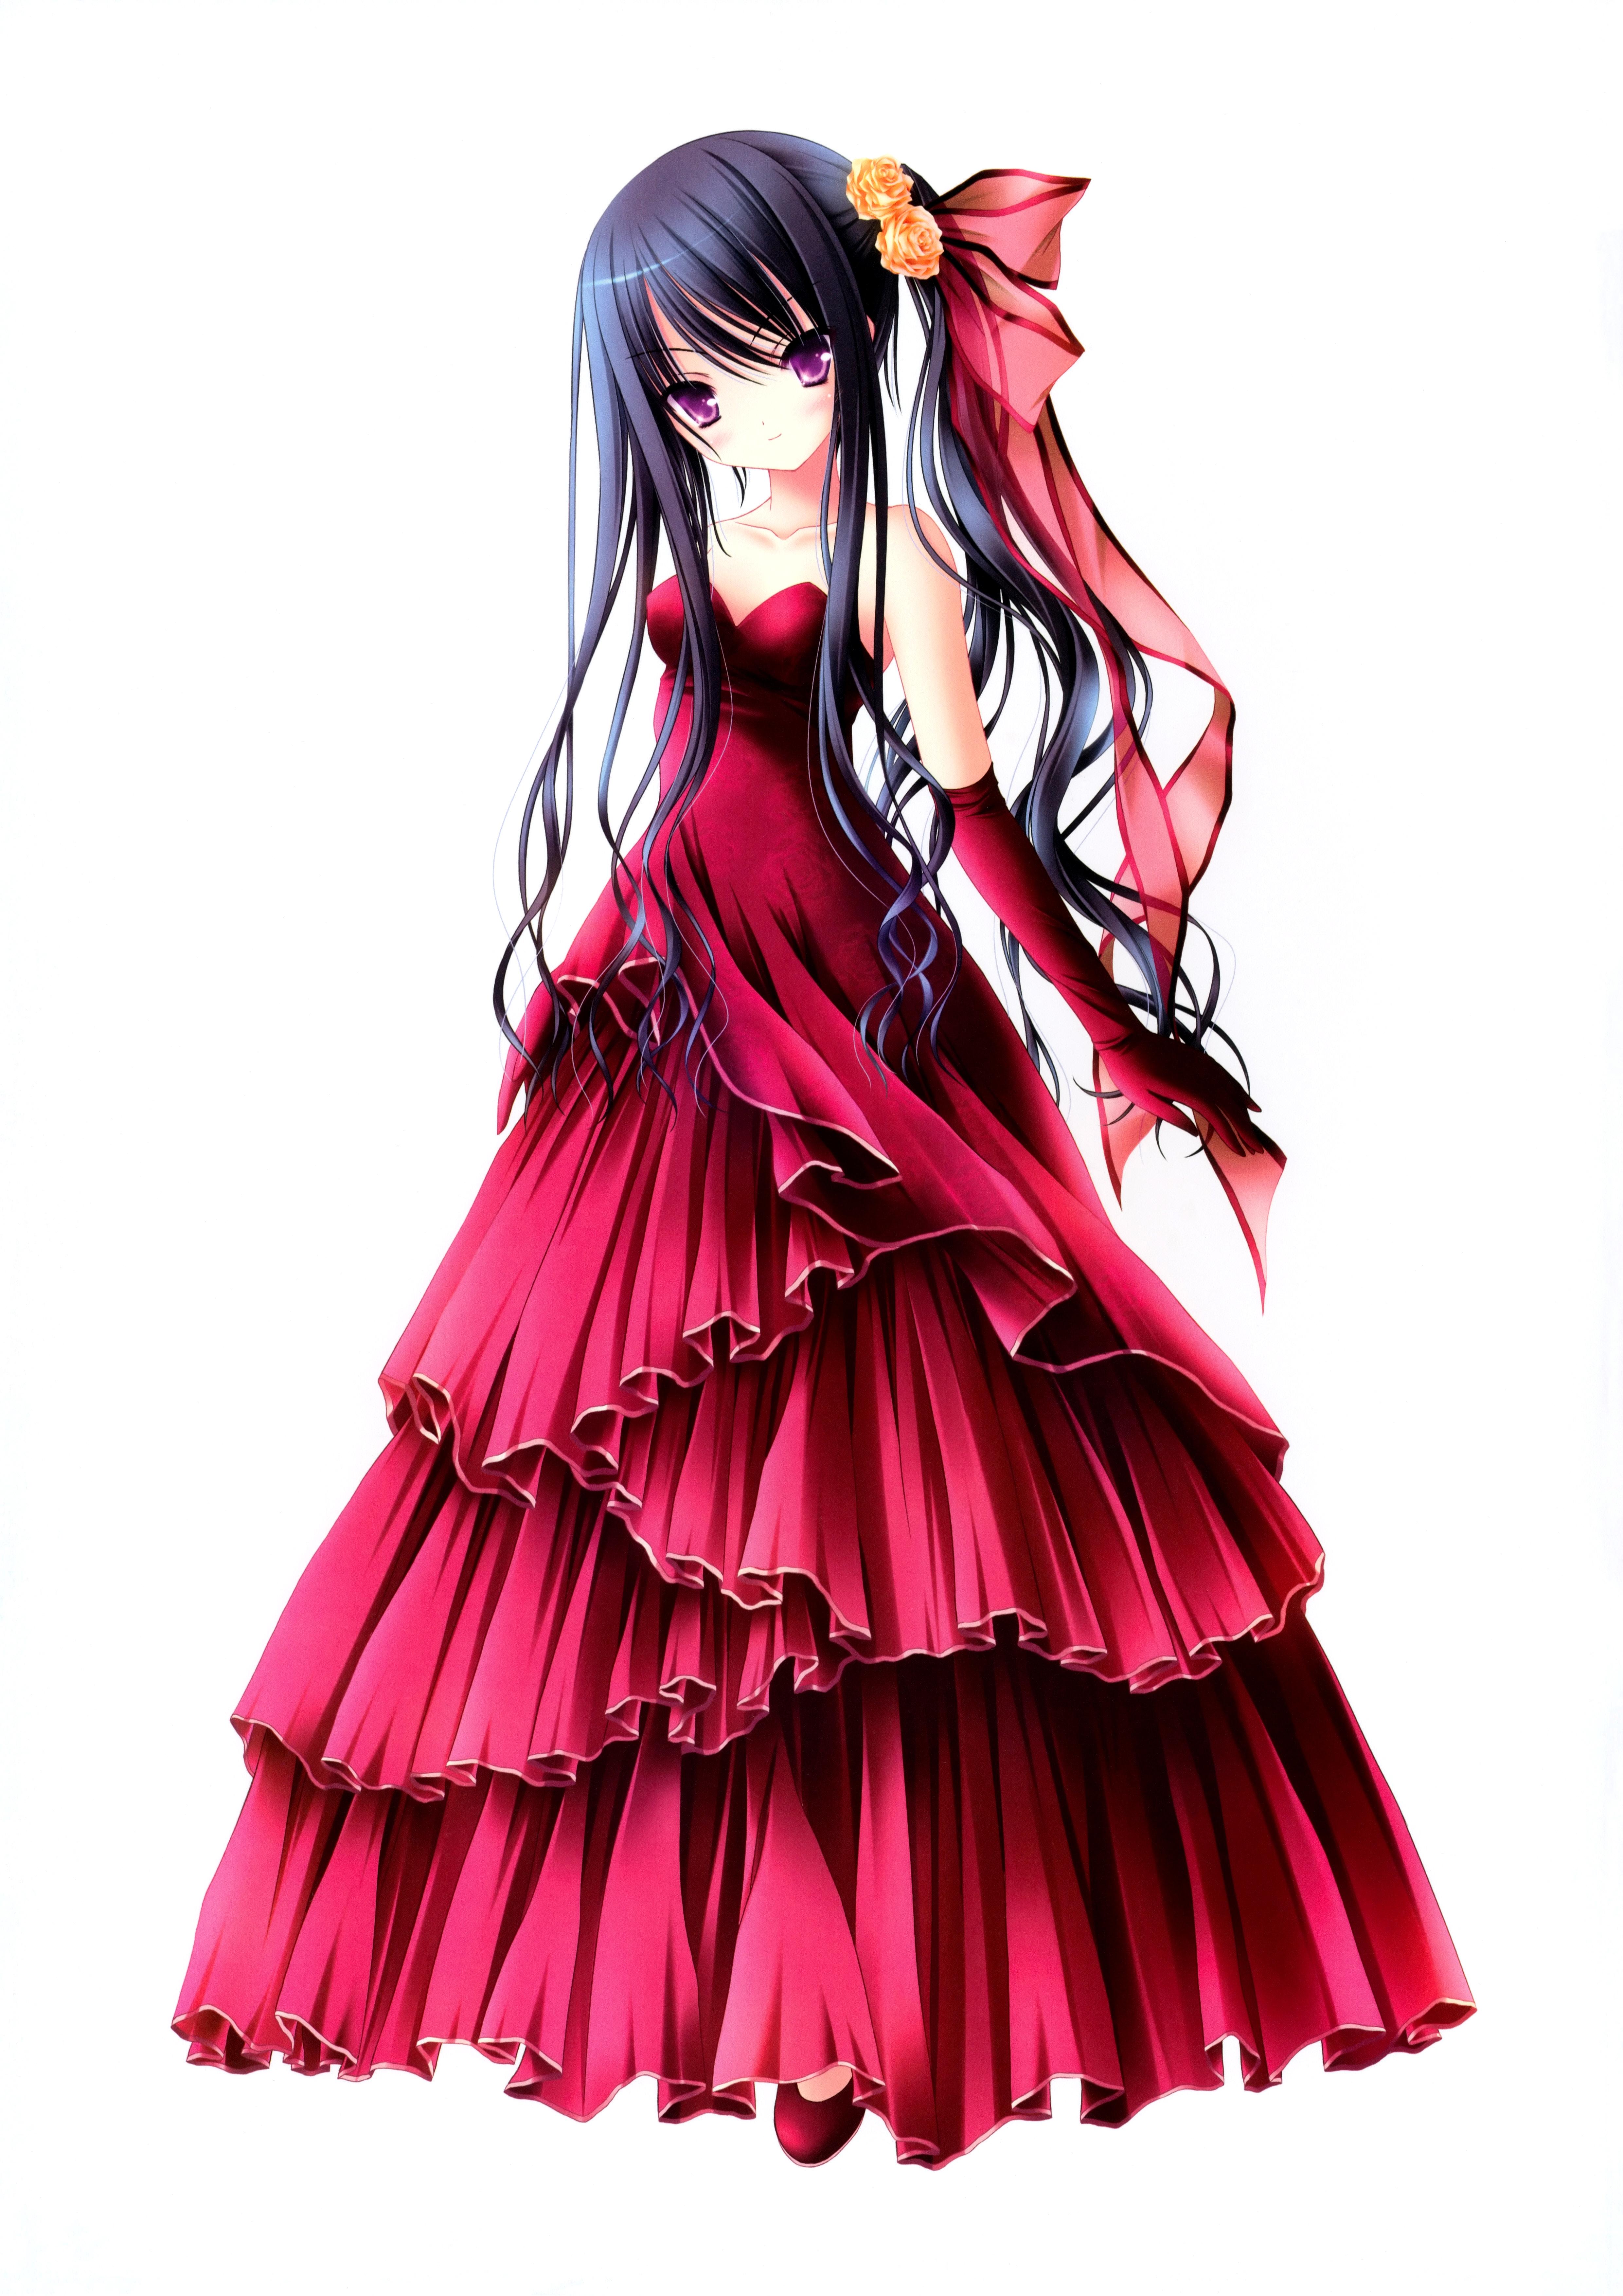 Love Kano - Tinkerbell - Zerochan Anime Image Board